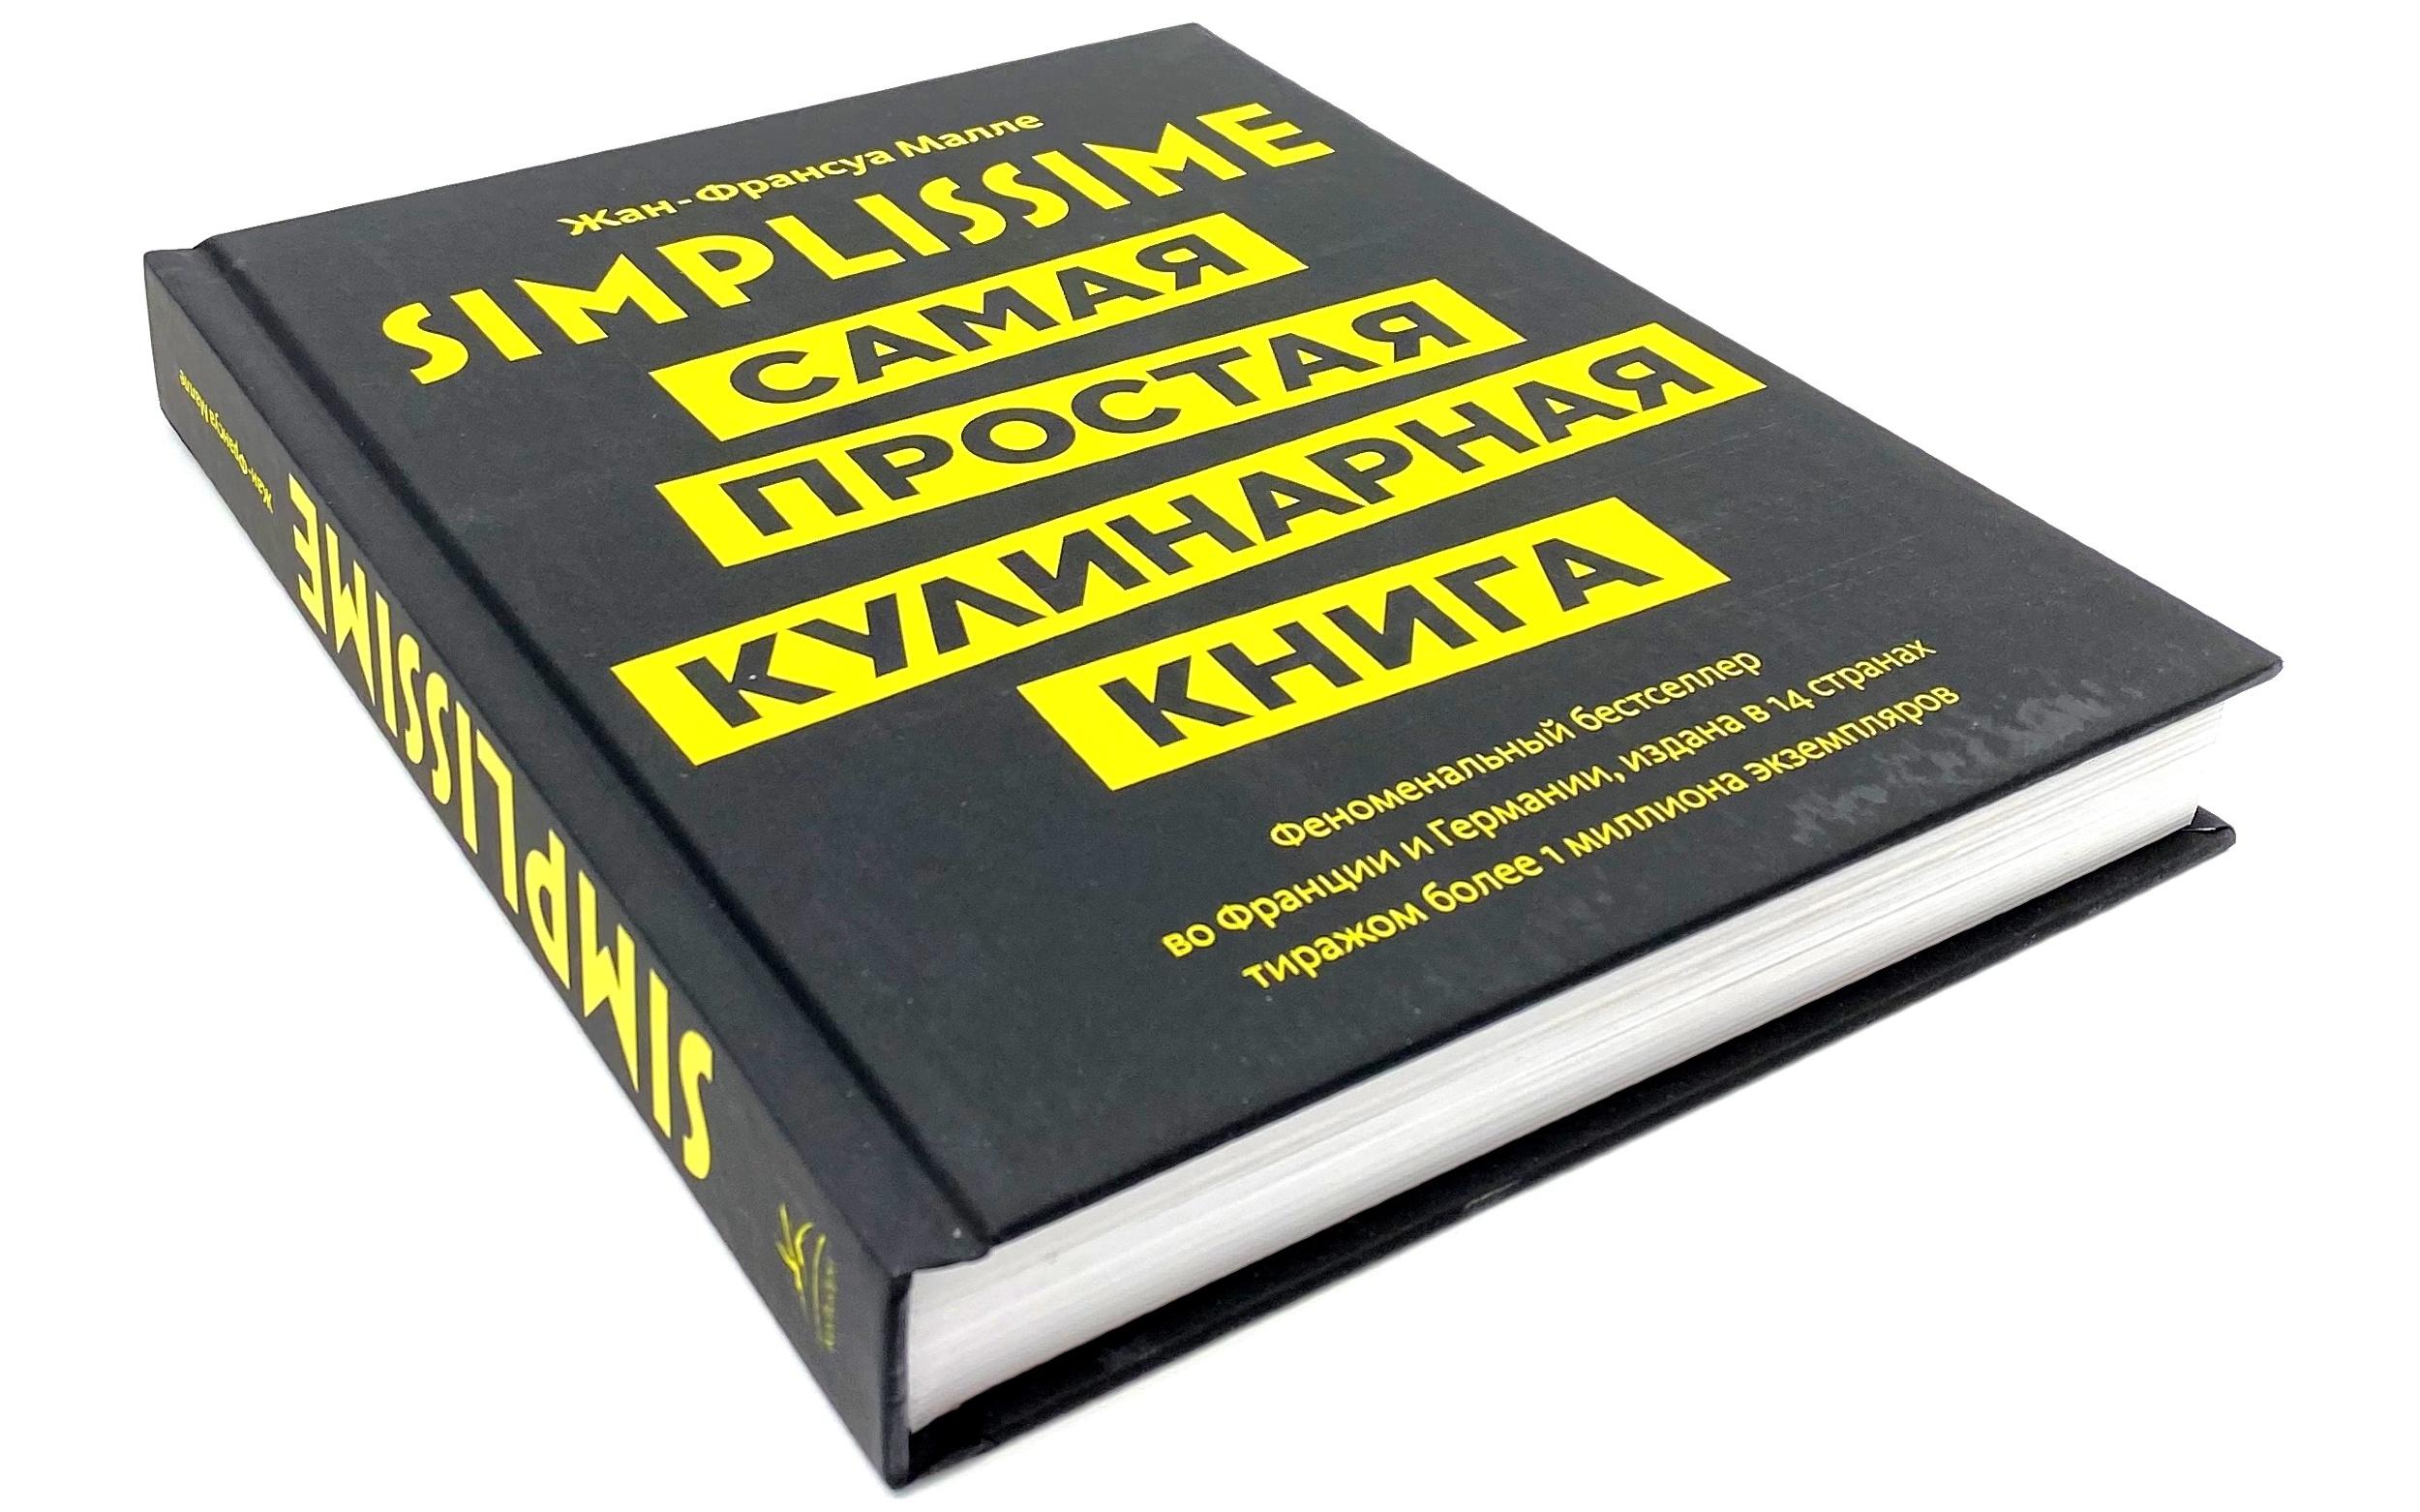 Simplissime: самая простая кулинарная книга. Автор — Жан-Франсуа Малле.